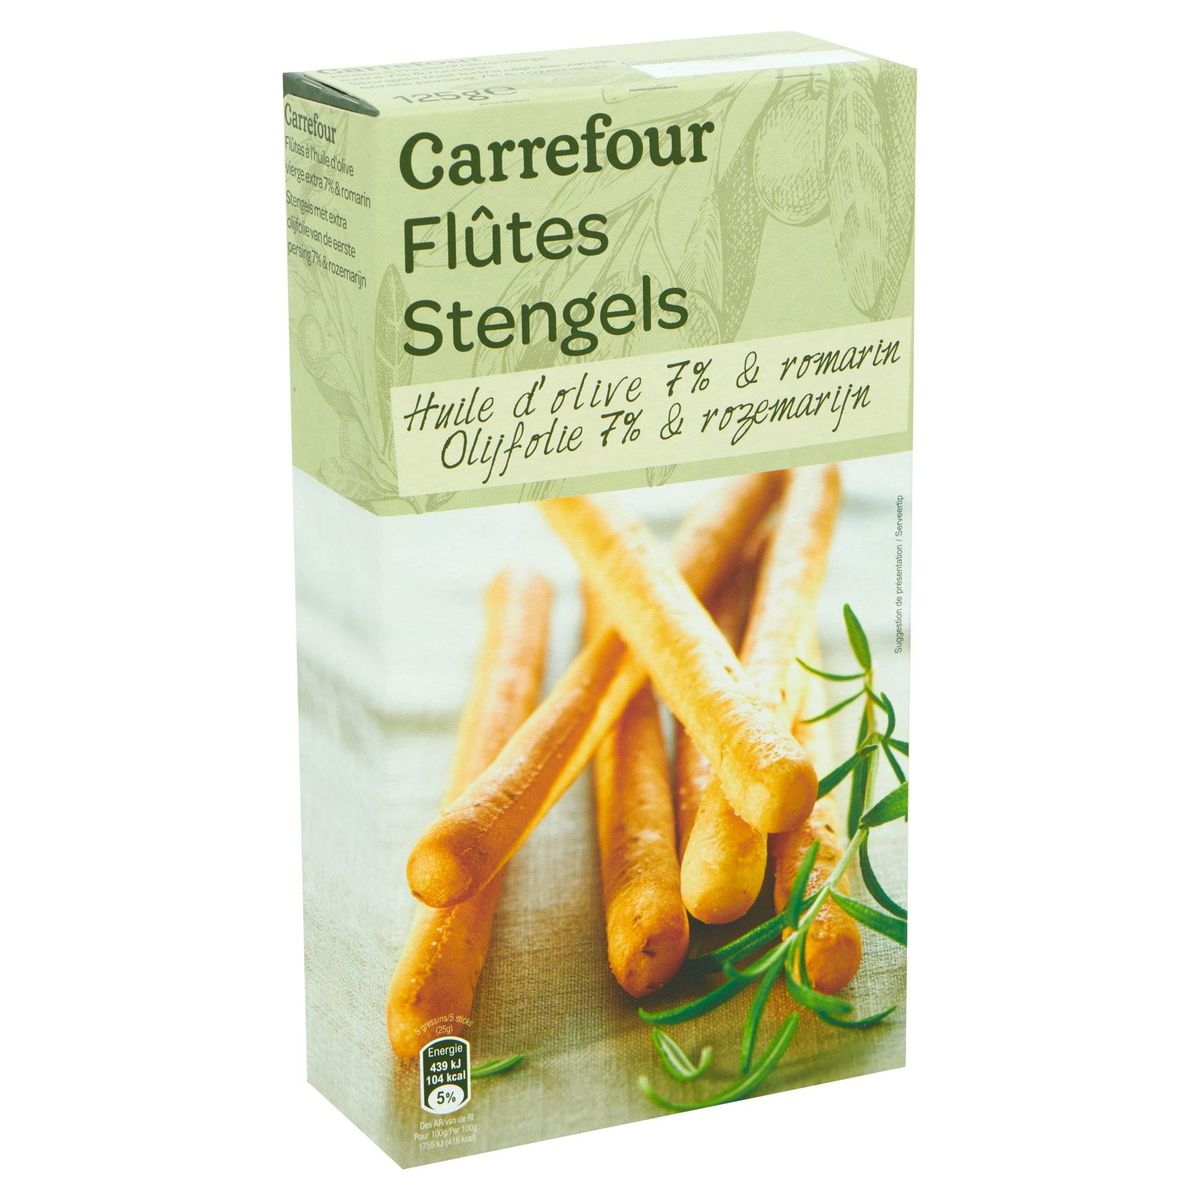 Carrefour Flûtes Huile d'Olive 7% & Romarin 125 g